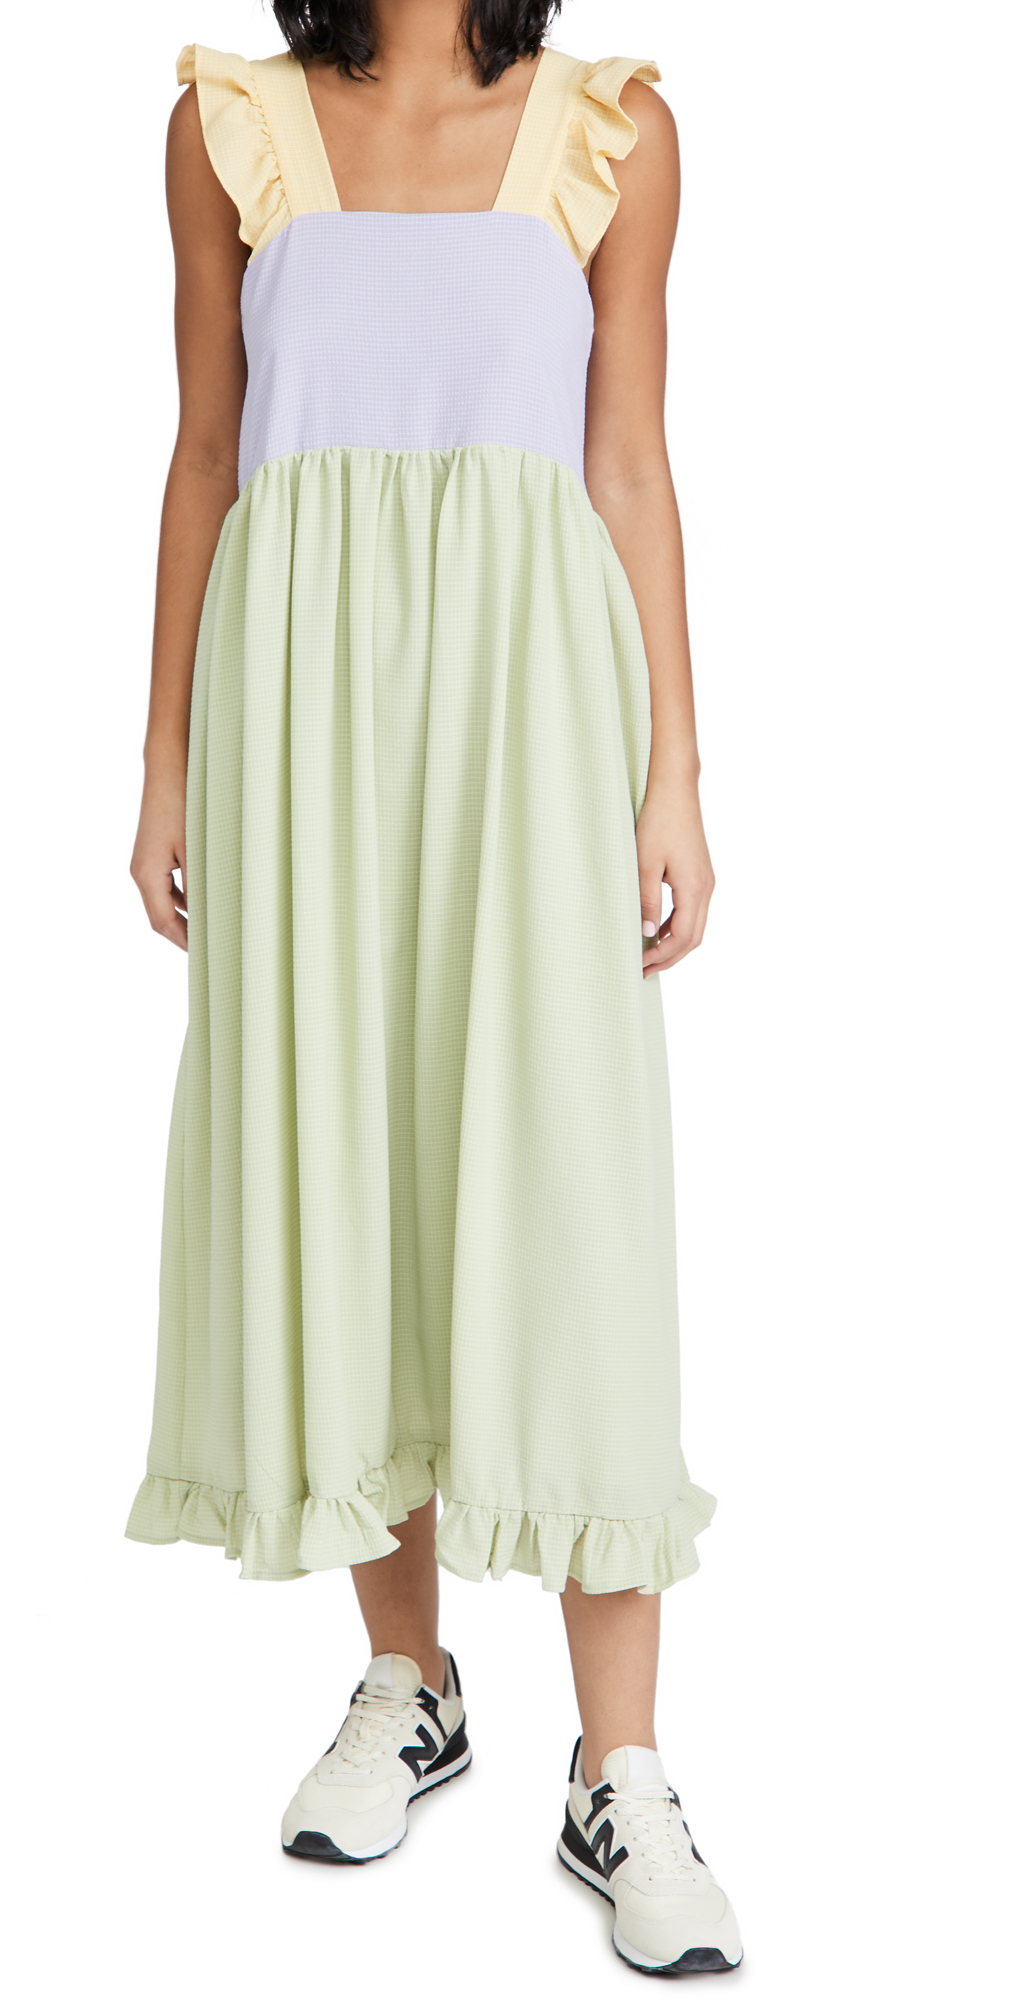 Sister Jane Fun and Frolics Midi Dress